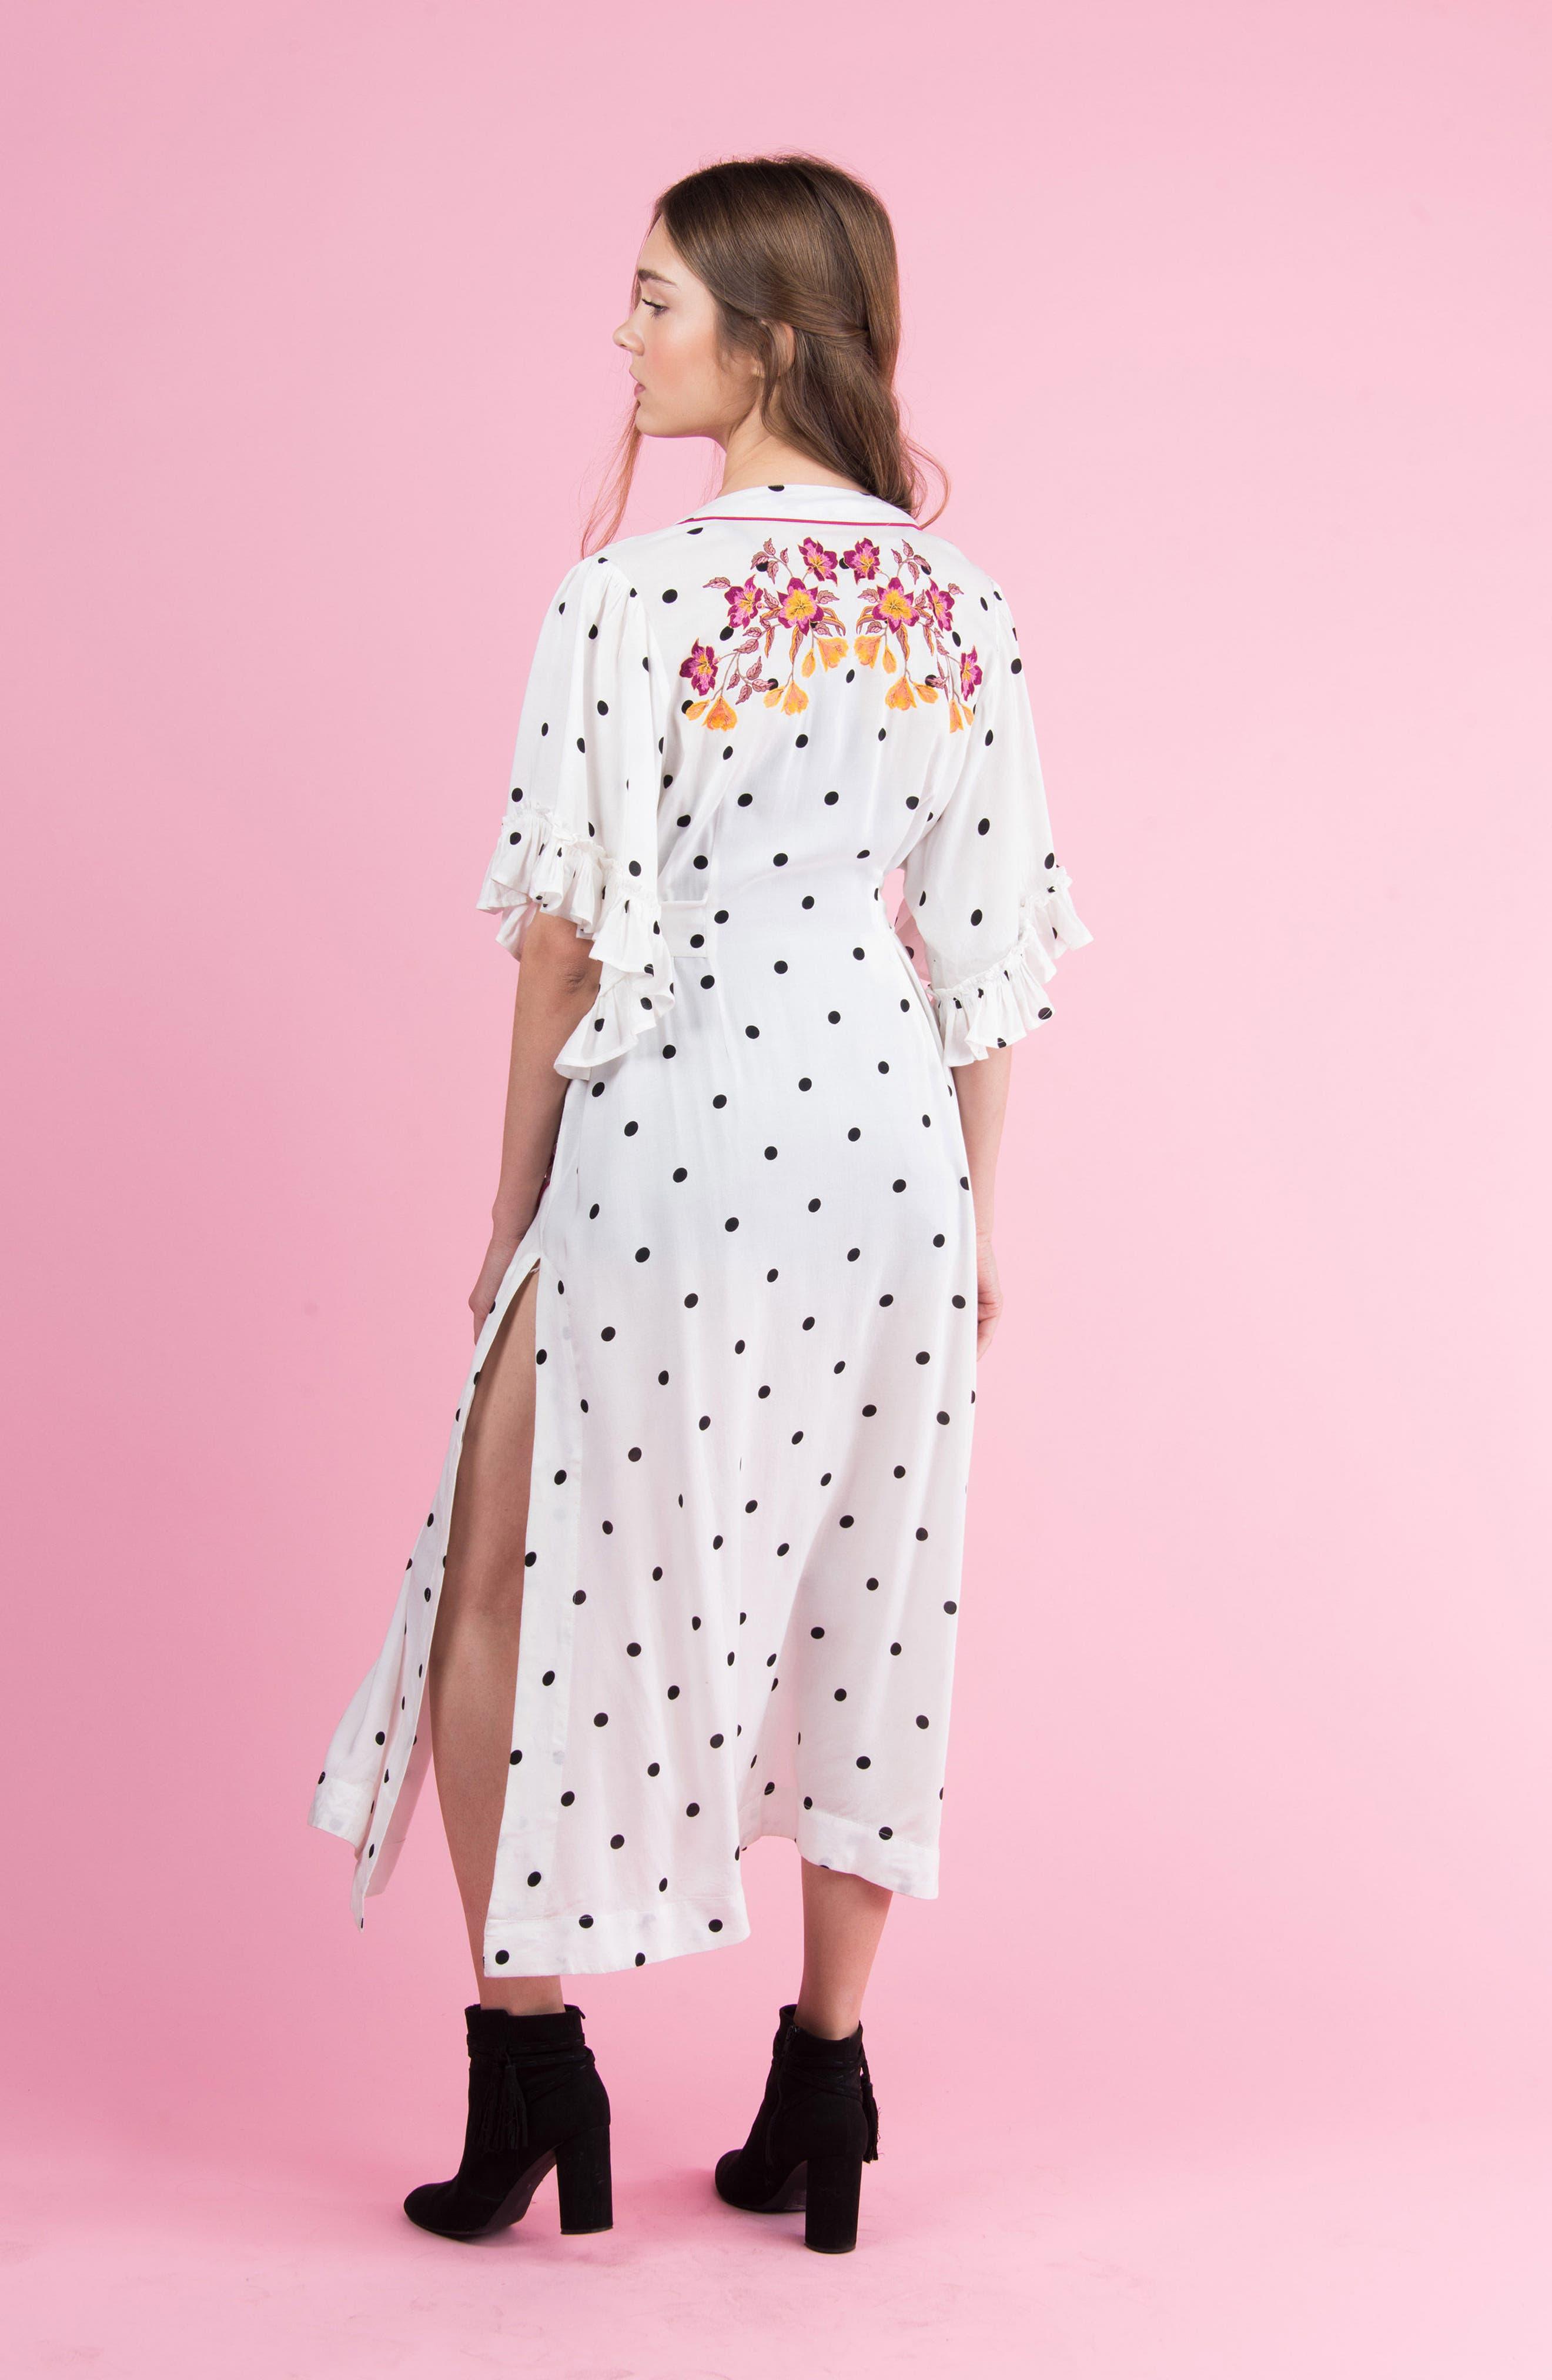 Hot Spot Kimono,                             Alternate thumbnail 8, color,                             Black/ White Polka Dot Print